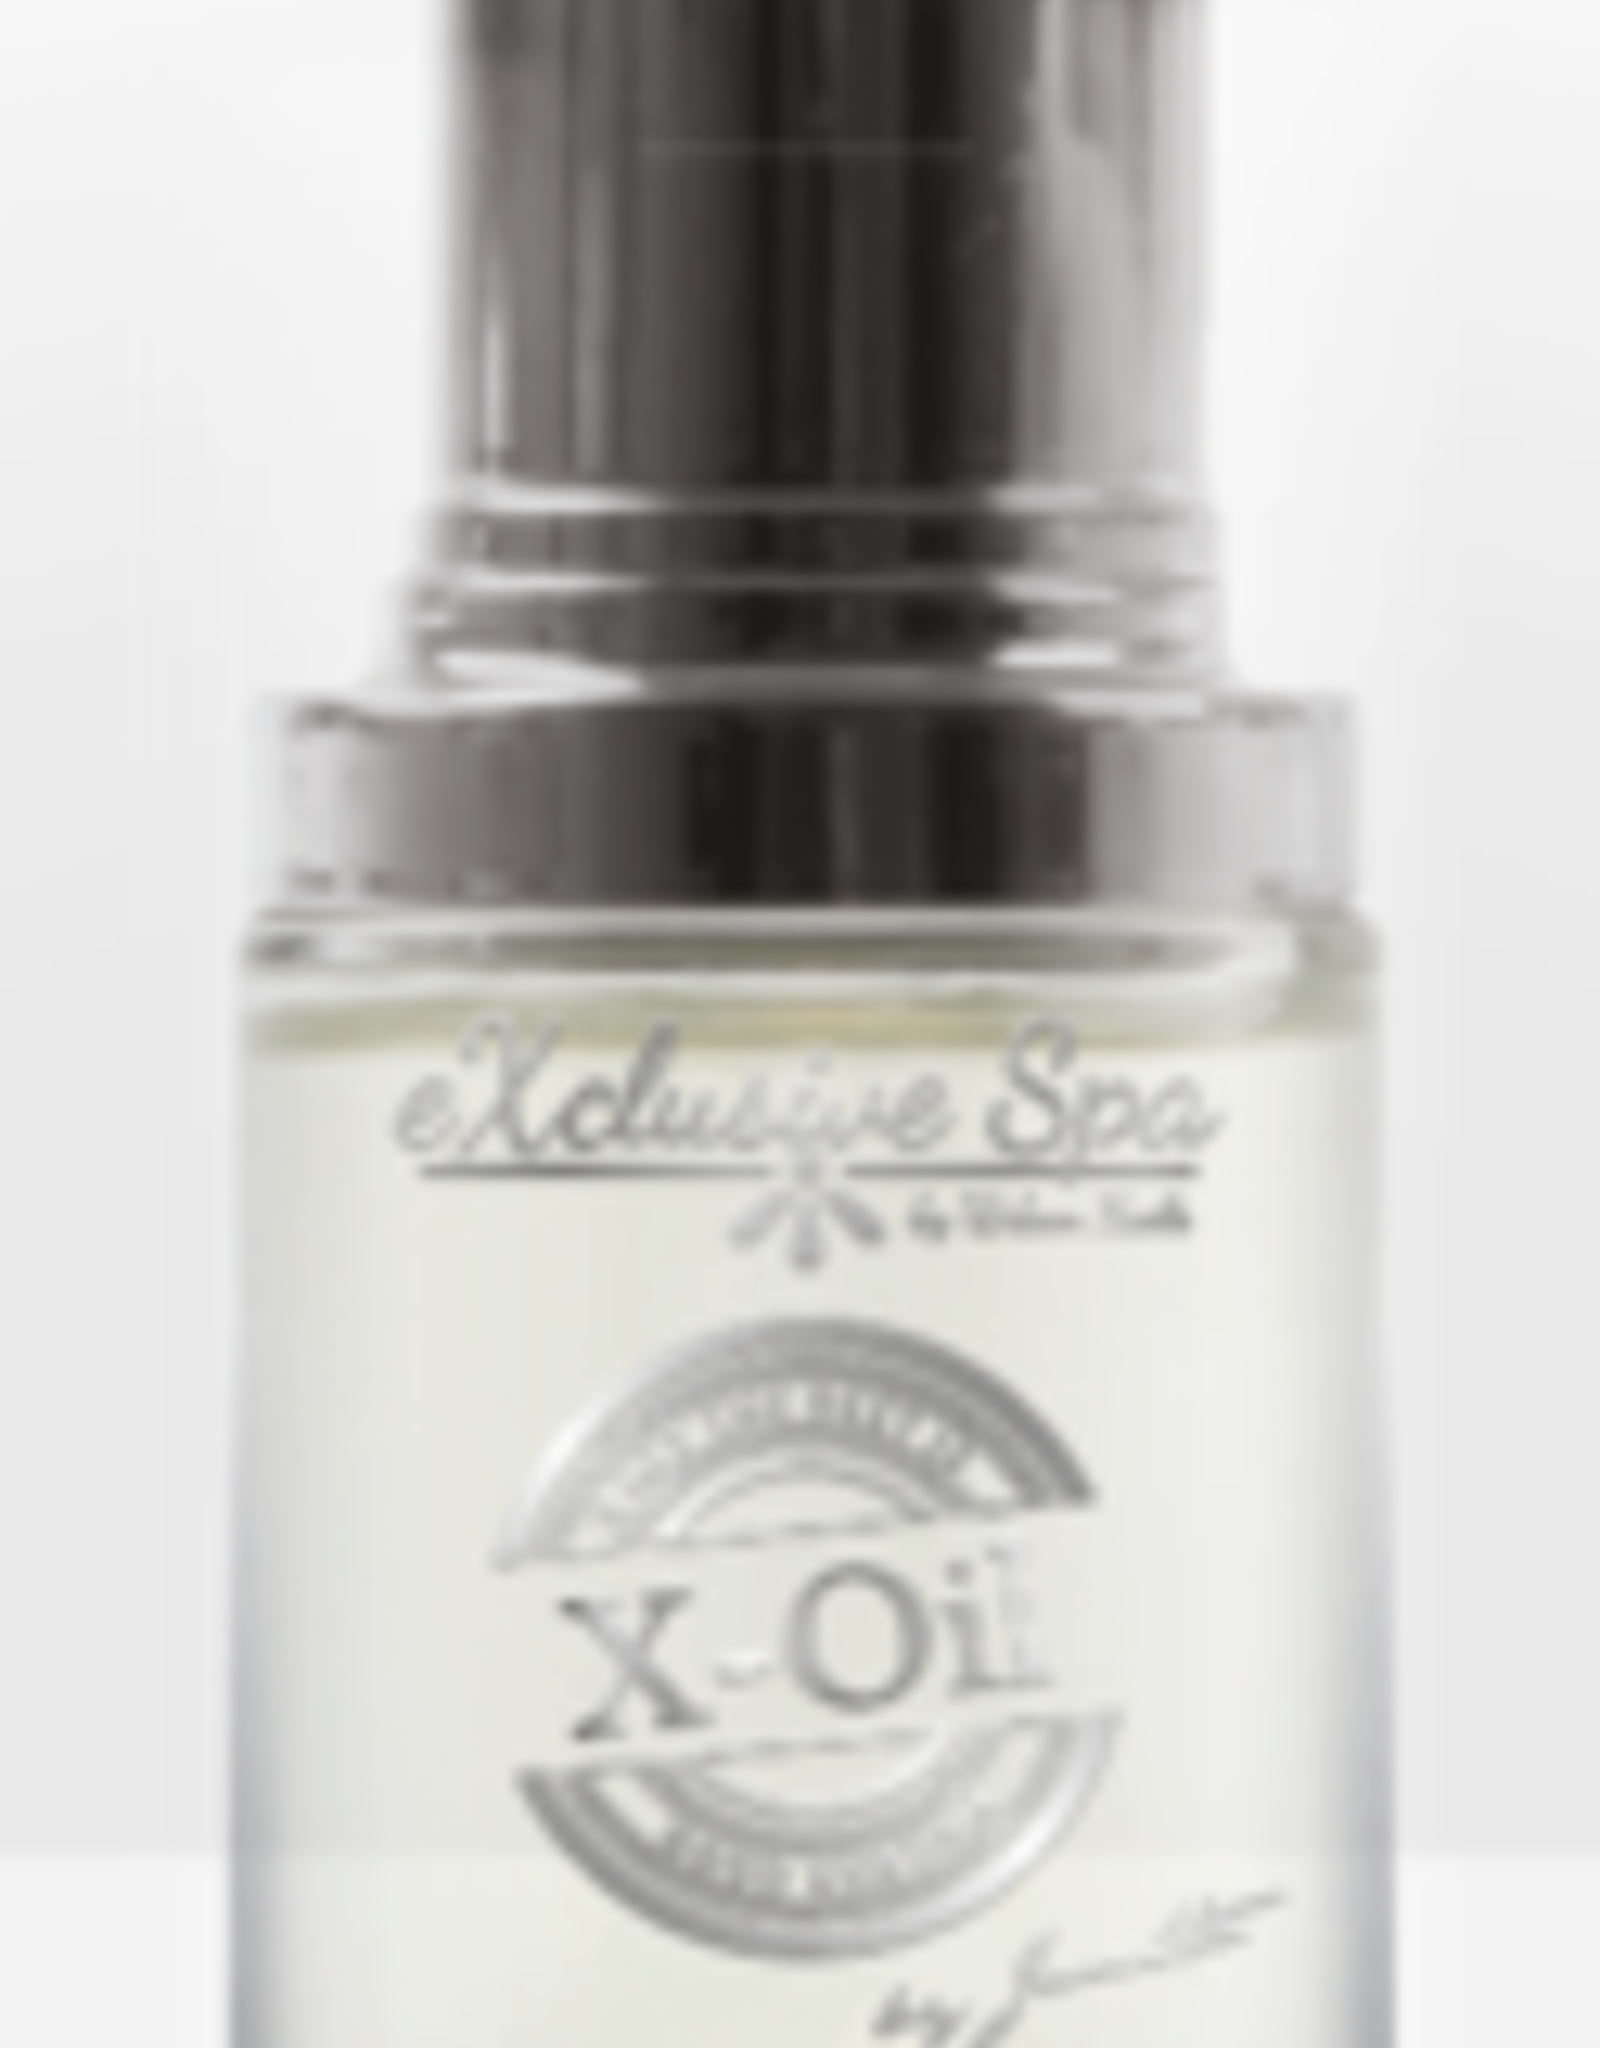 Urban Nails Exclusive Spa X-oil